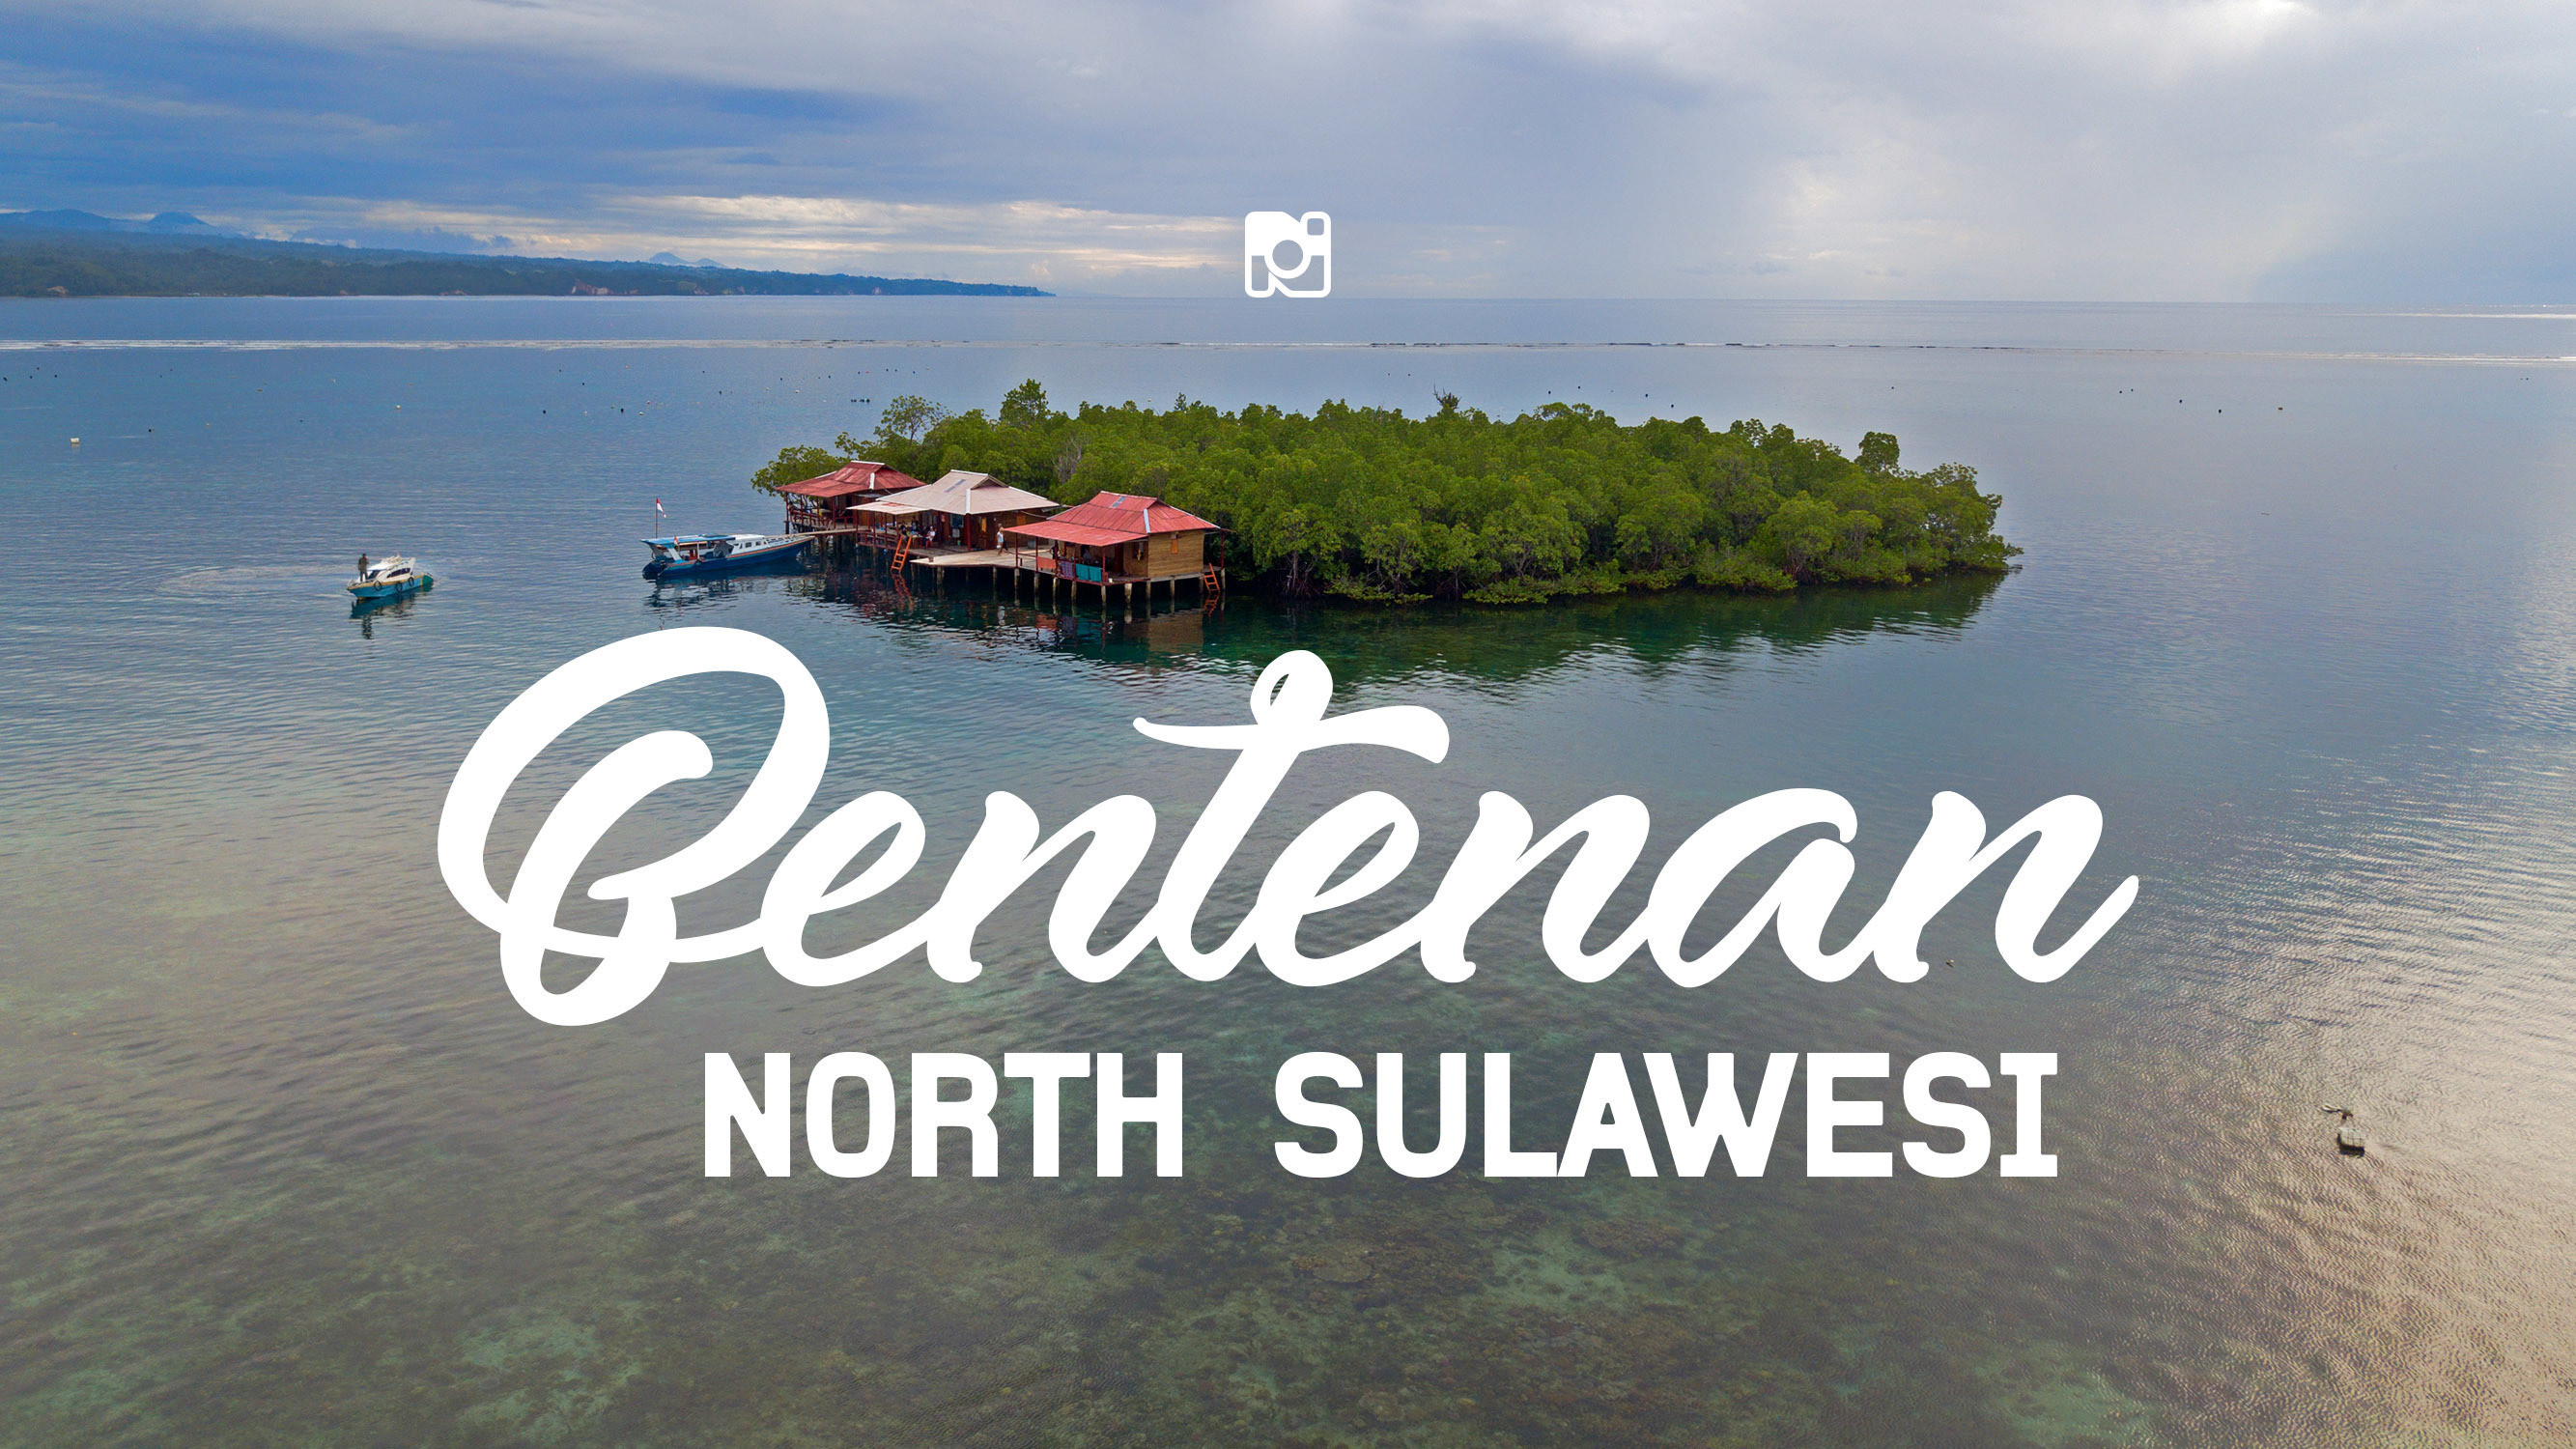 Pulau Bentenan Surganya Pencinta Terumbu Karang Terletak Setelah 3 Jam